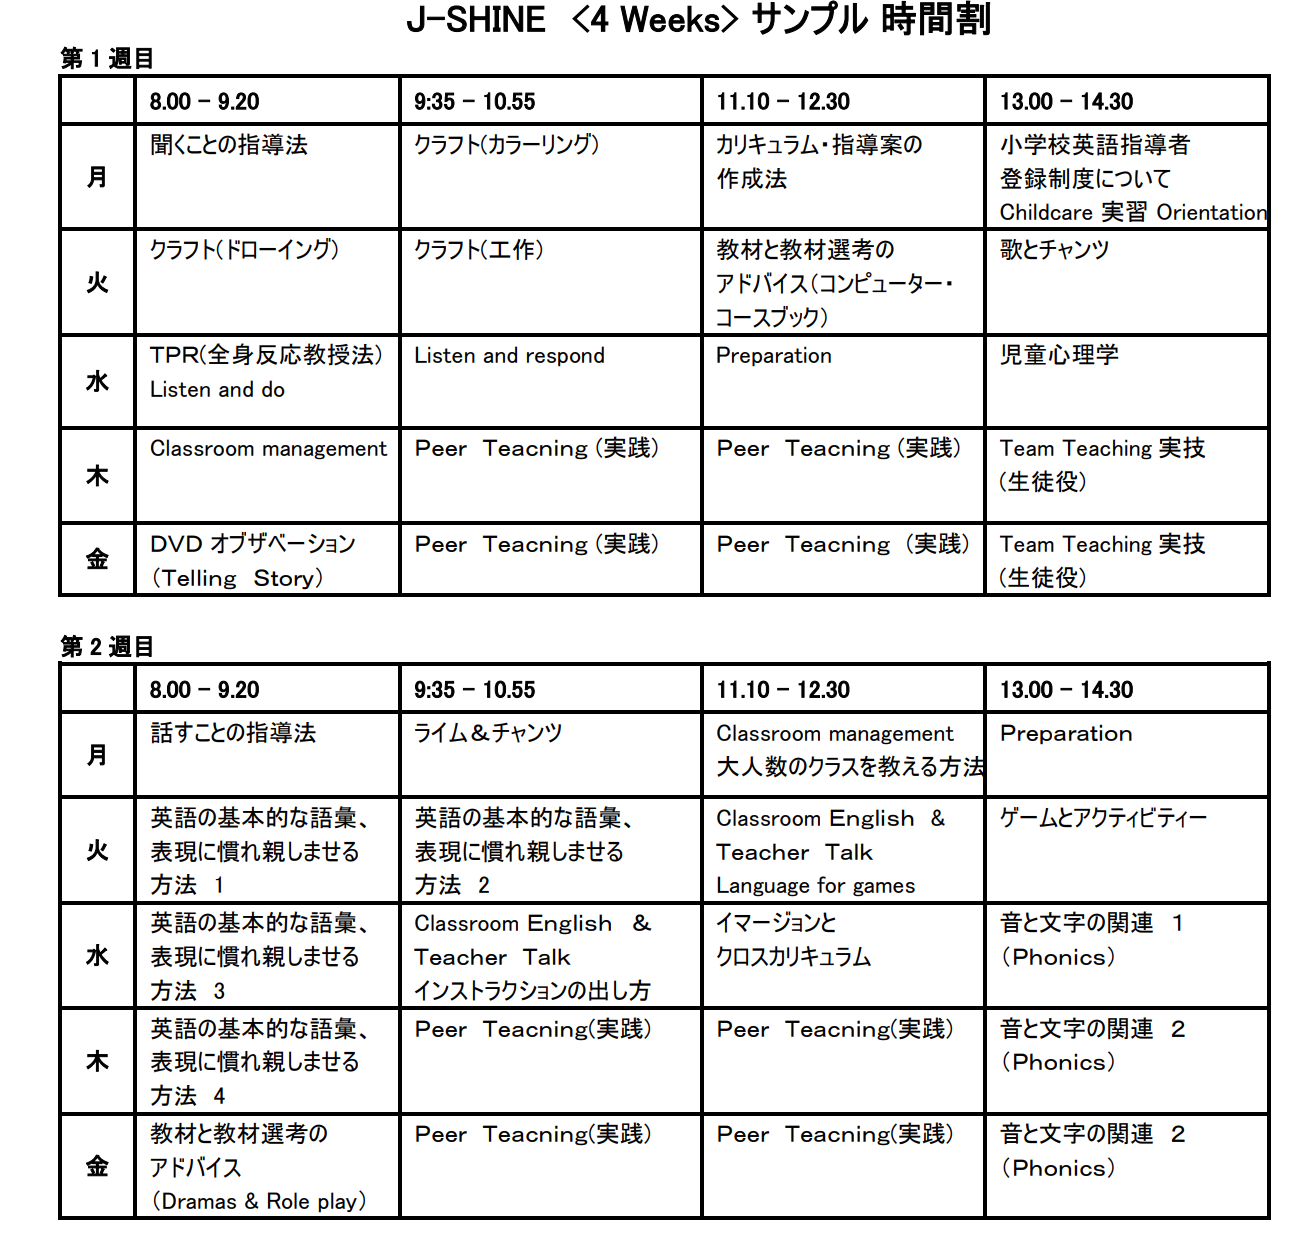 IH J-SHINEコースのサンプルタイムテーブル